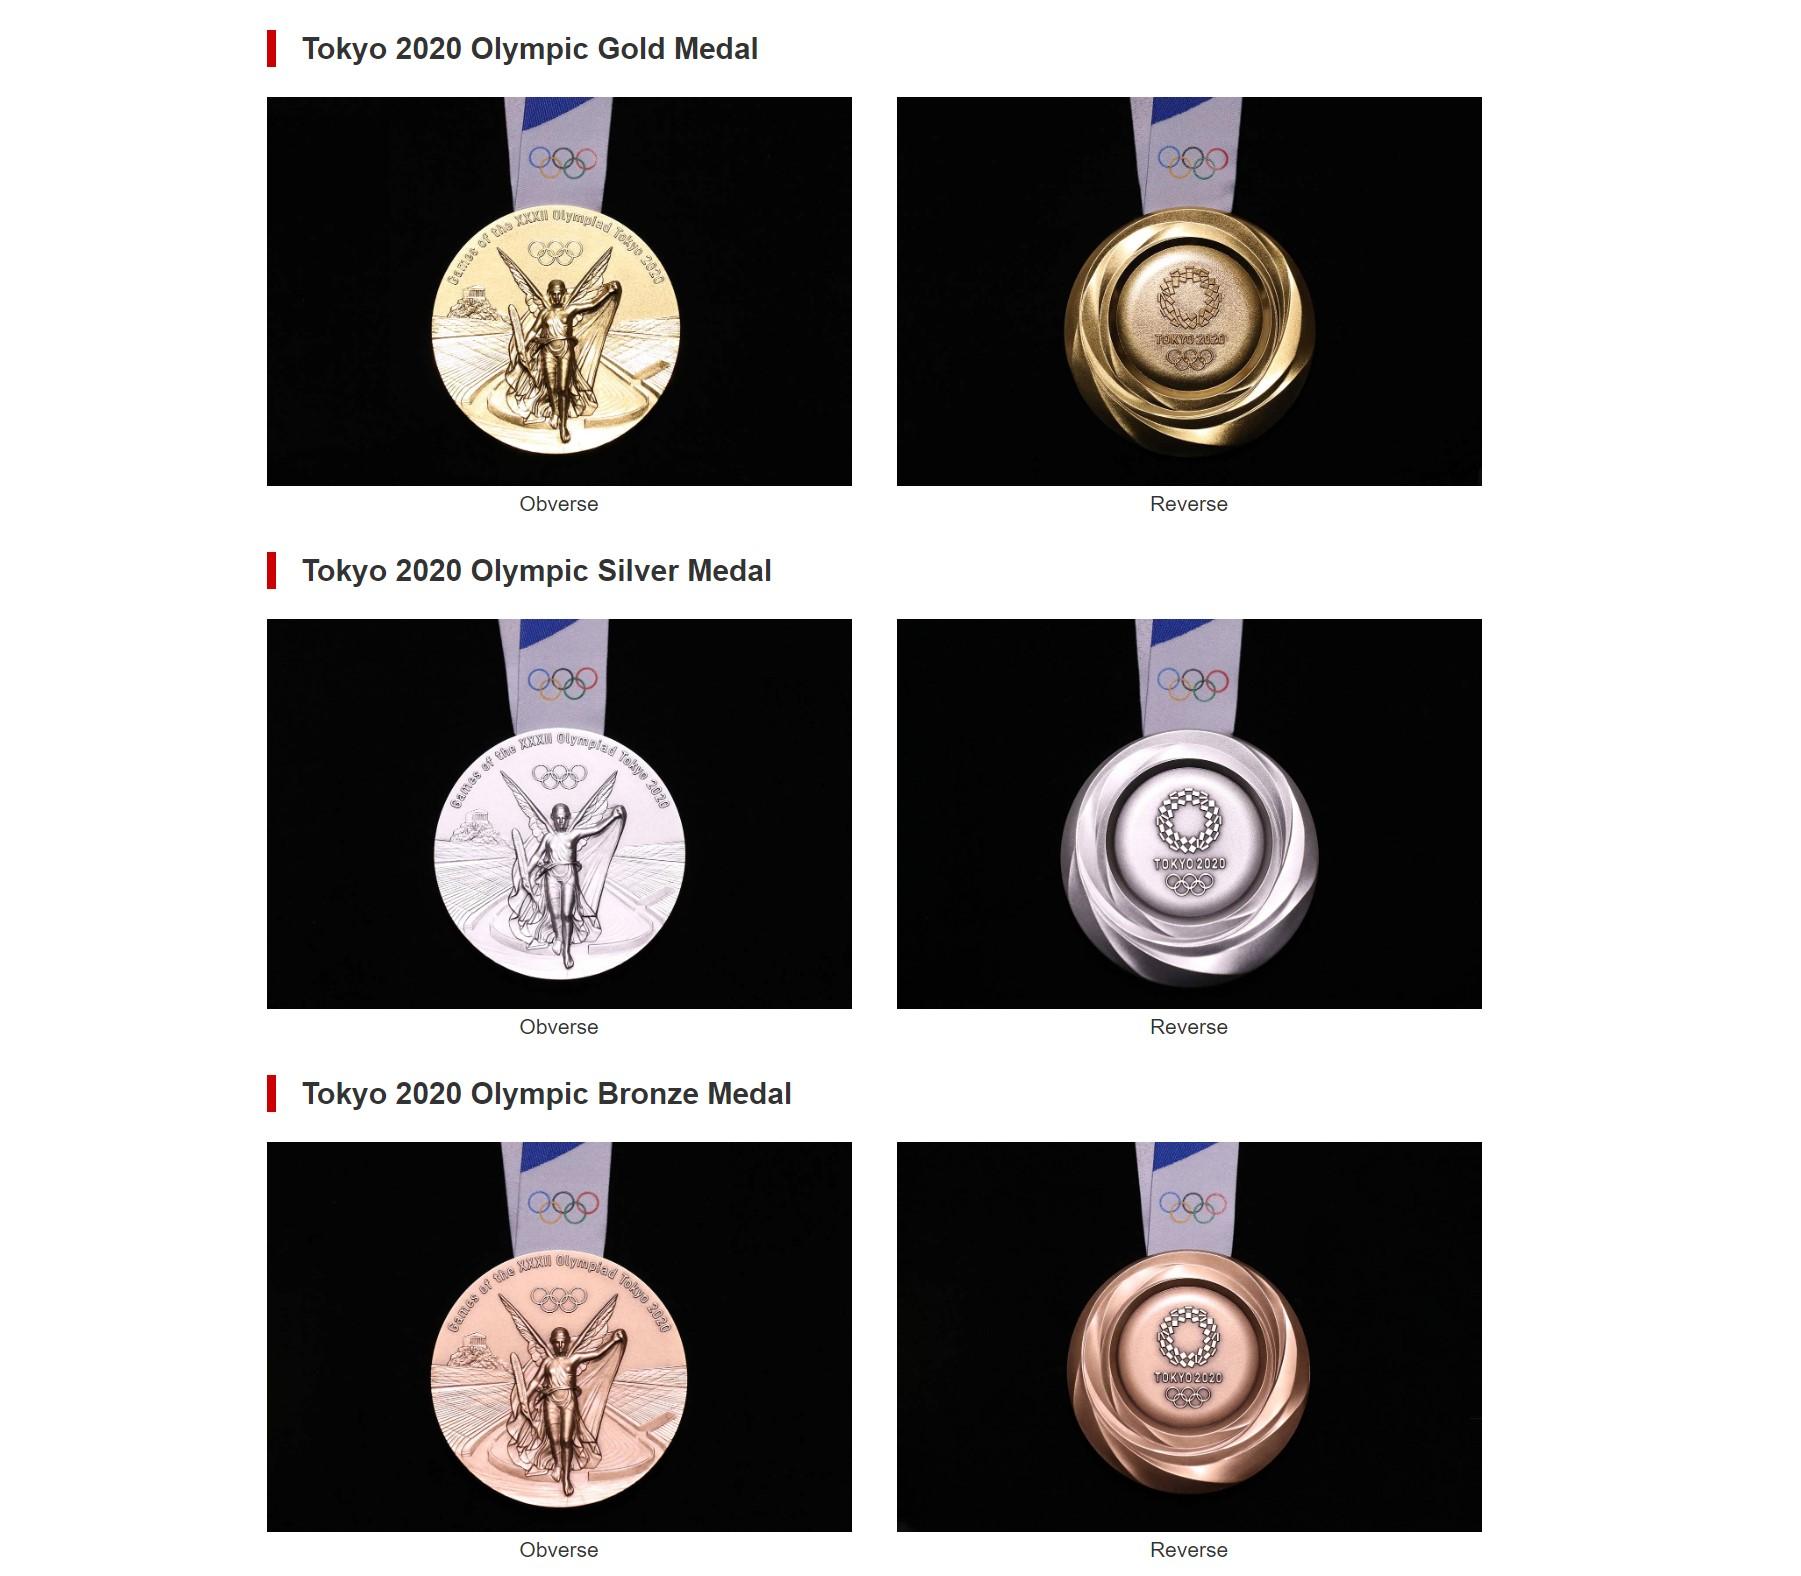 Medale Tokio 2020